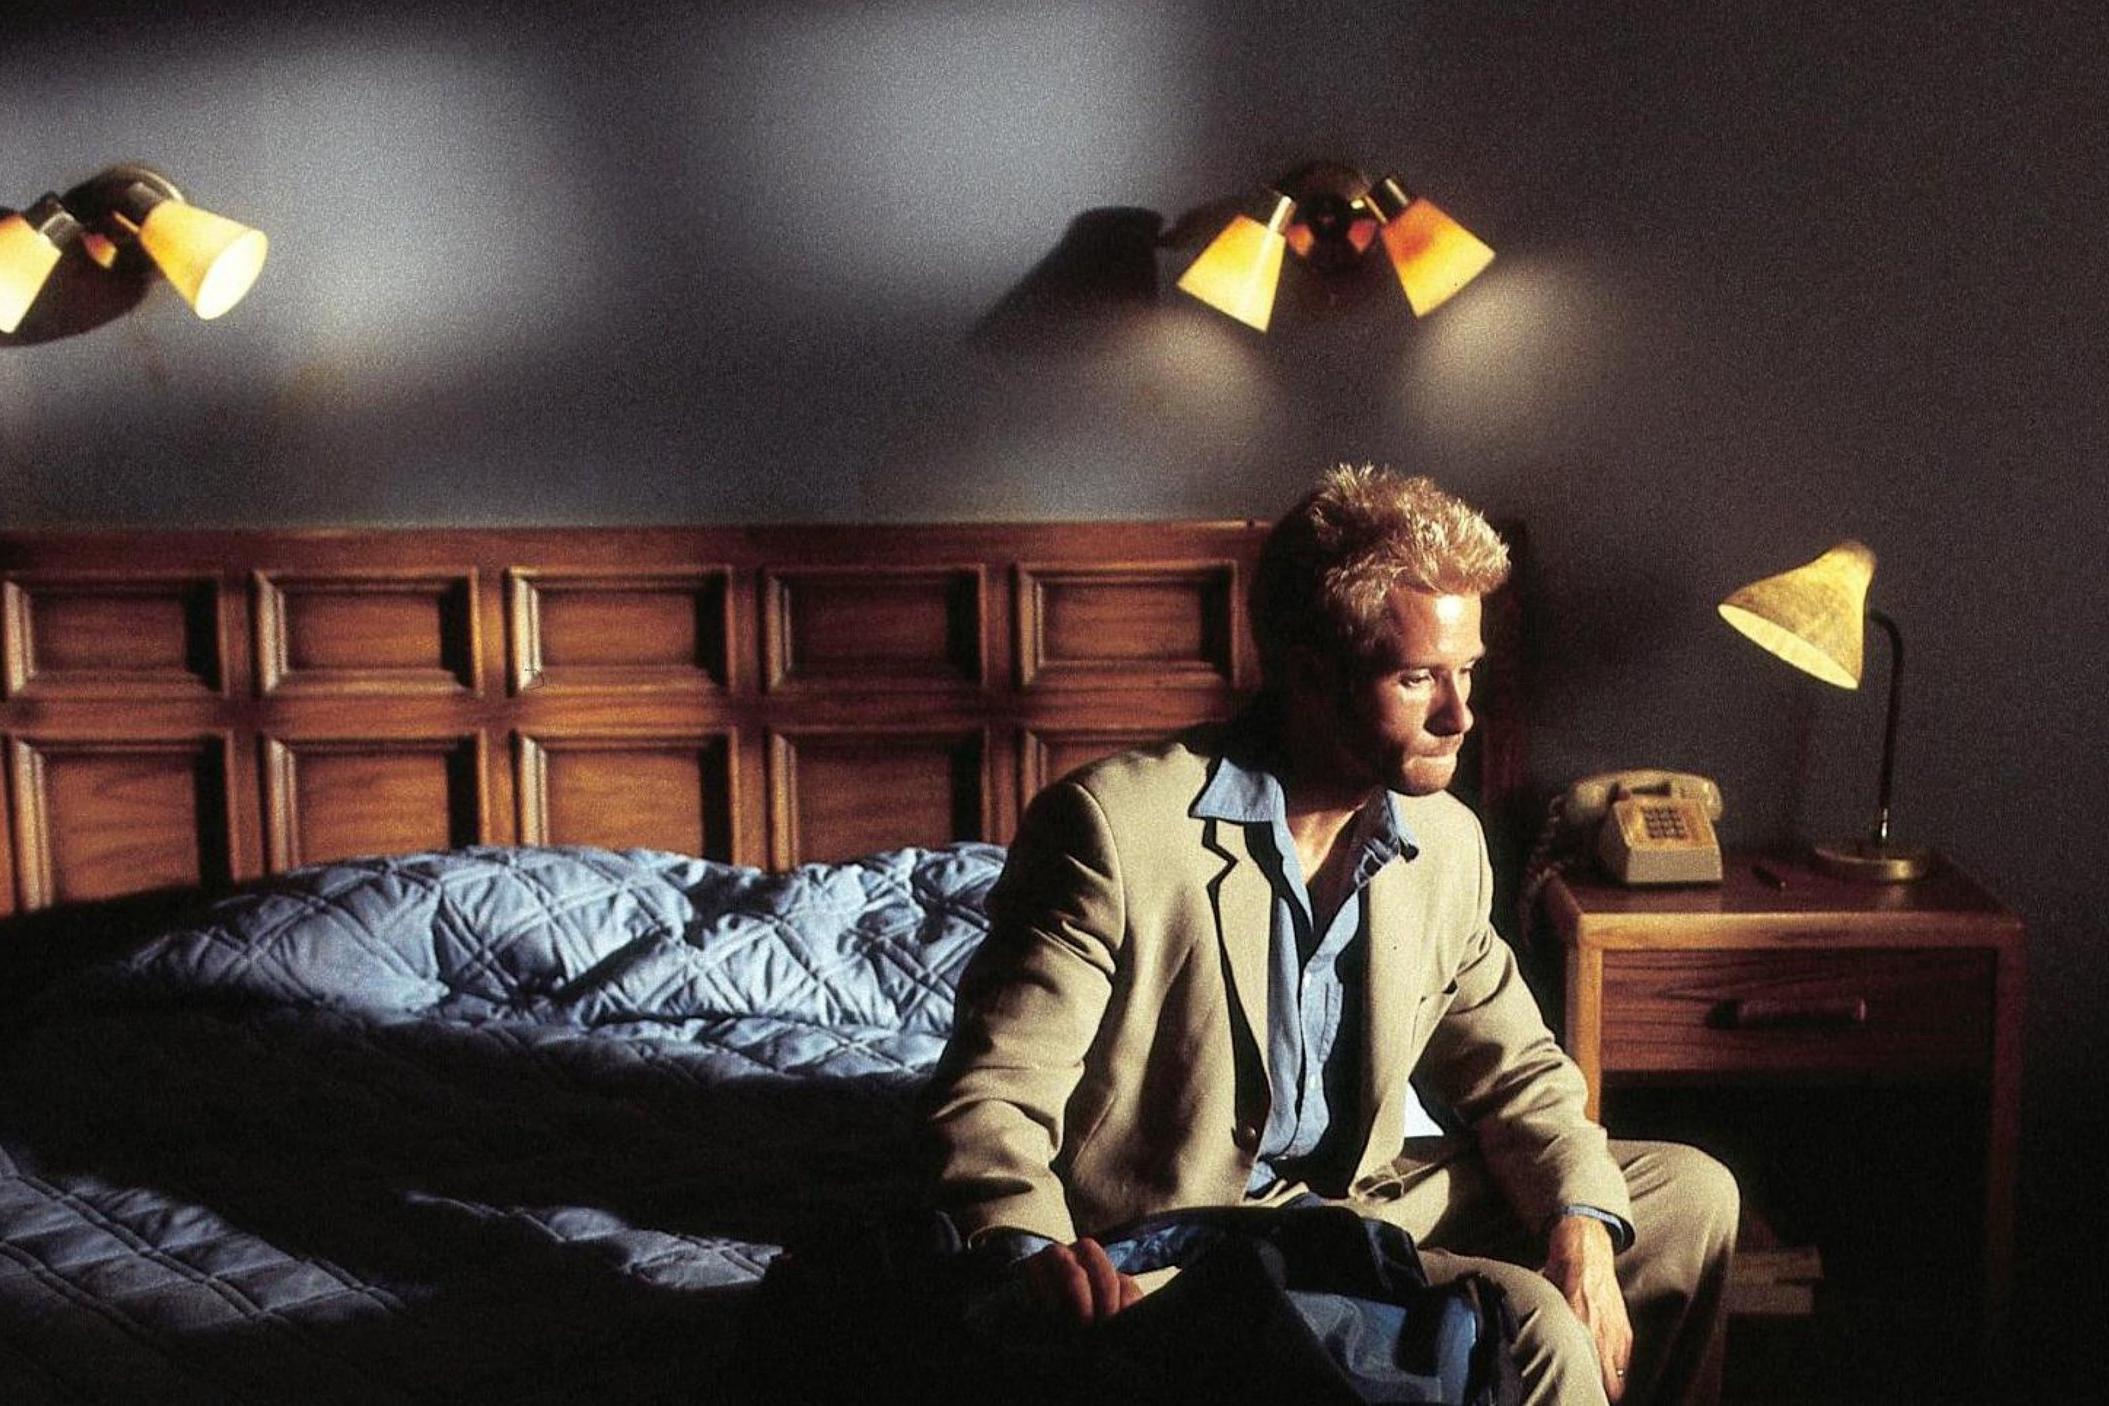 Memento (2000) - Directed by: Christopher NolanWritten by: Christopher Nolan & Jonathan Nolan (short story)